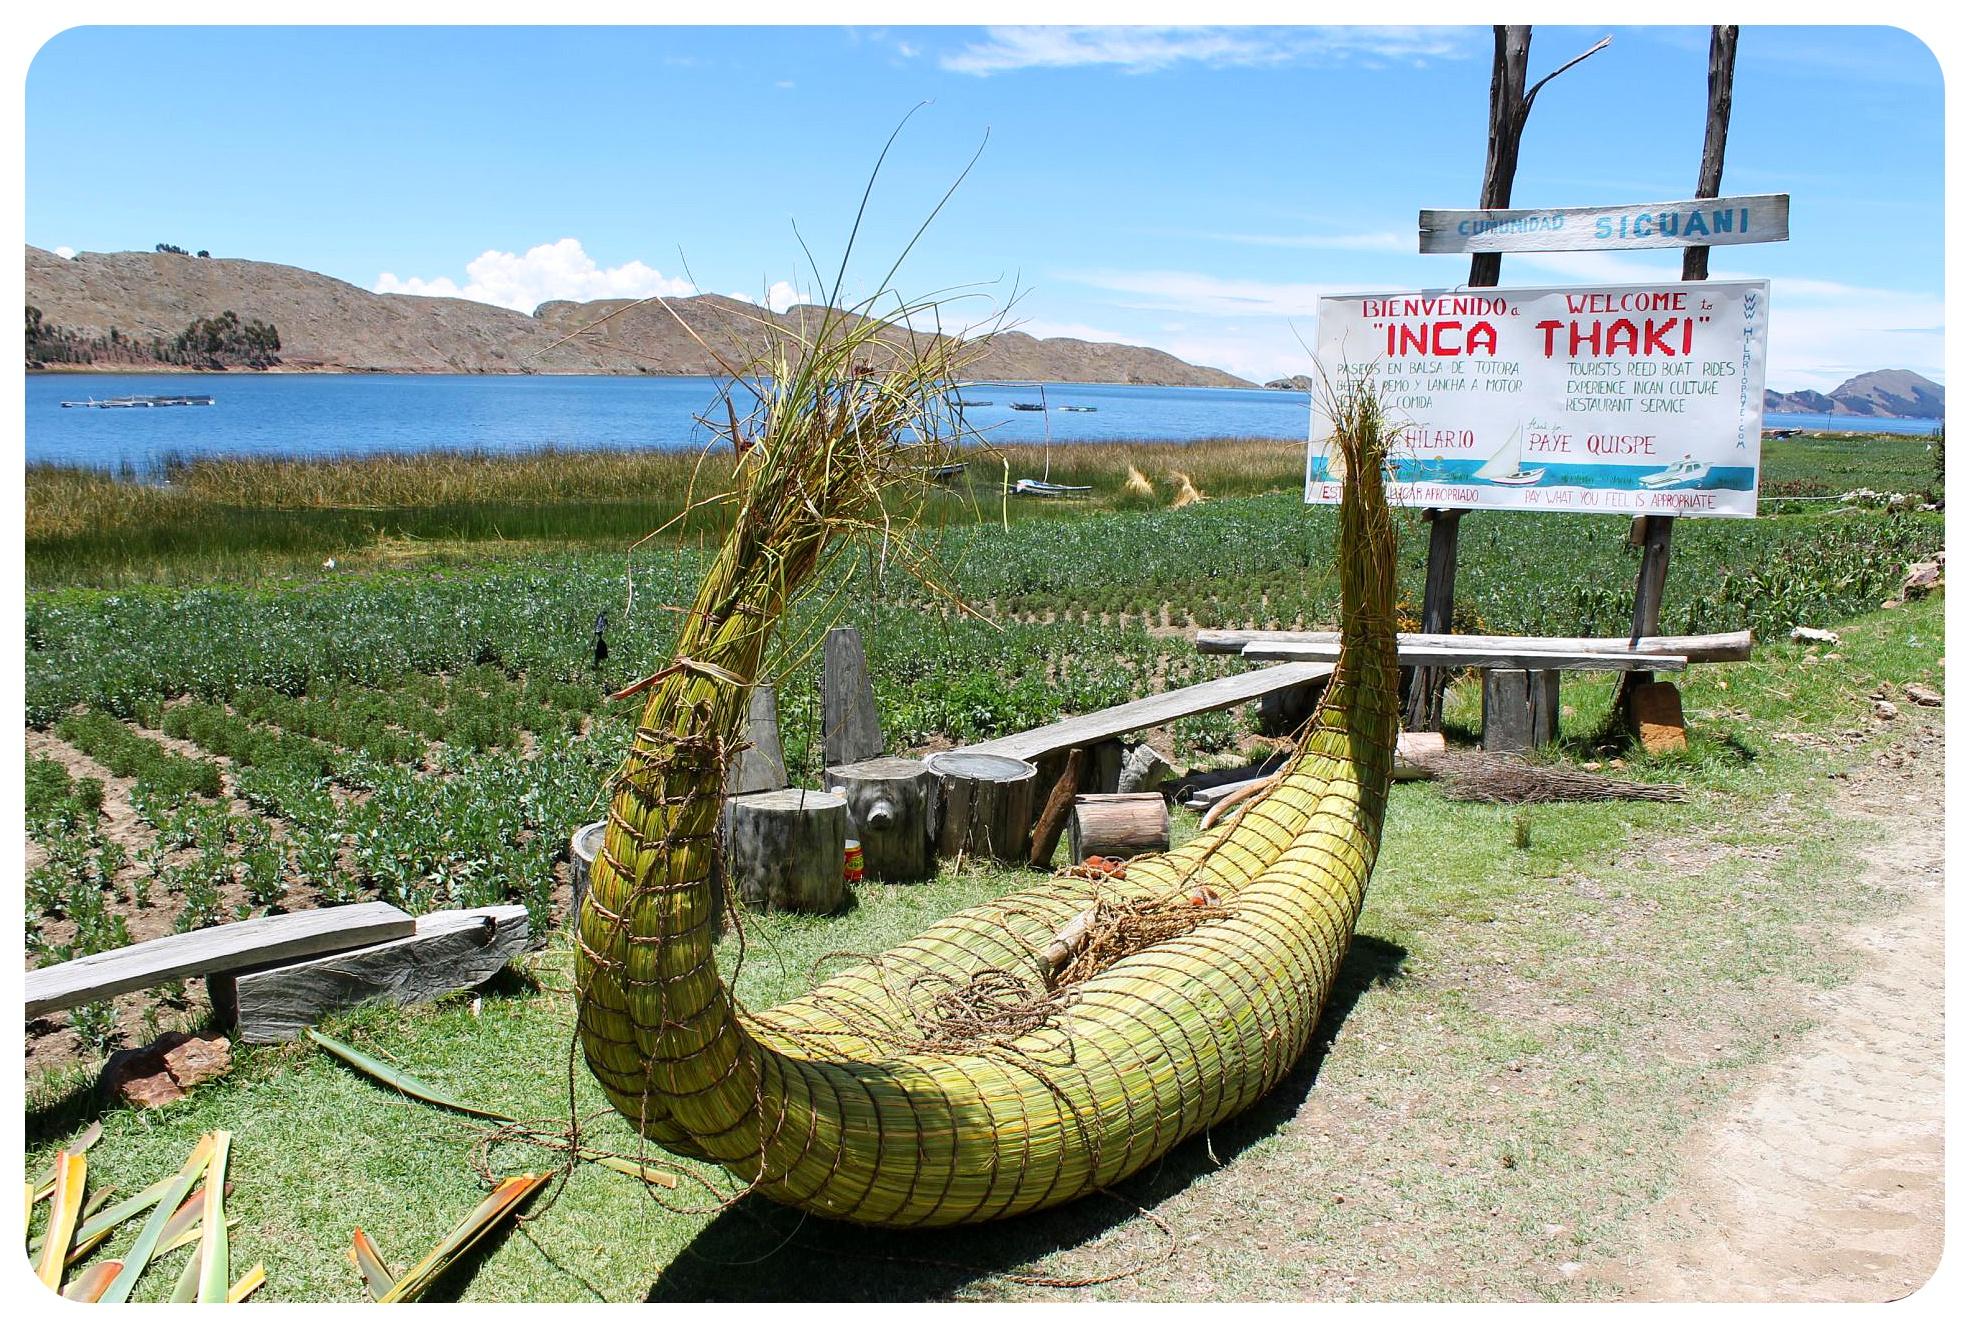 lake titicaca reed boat